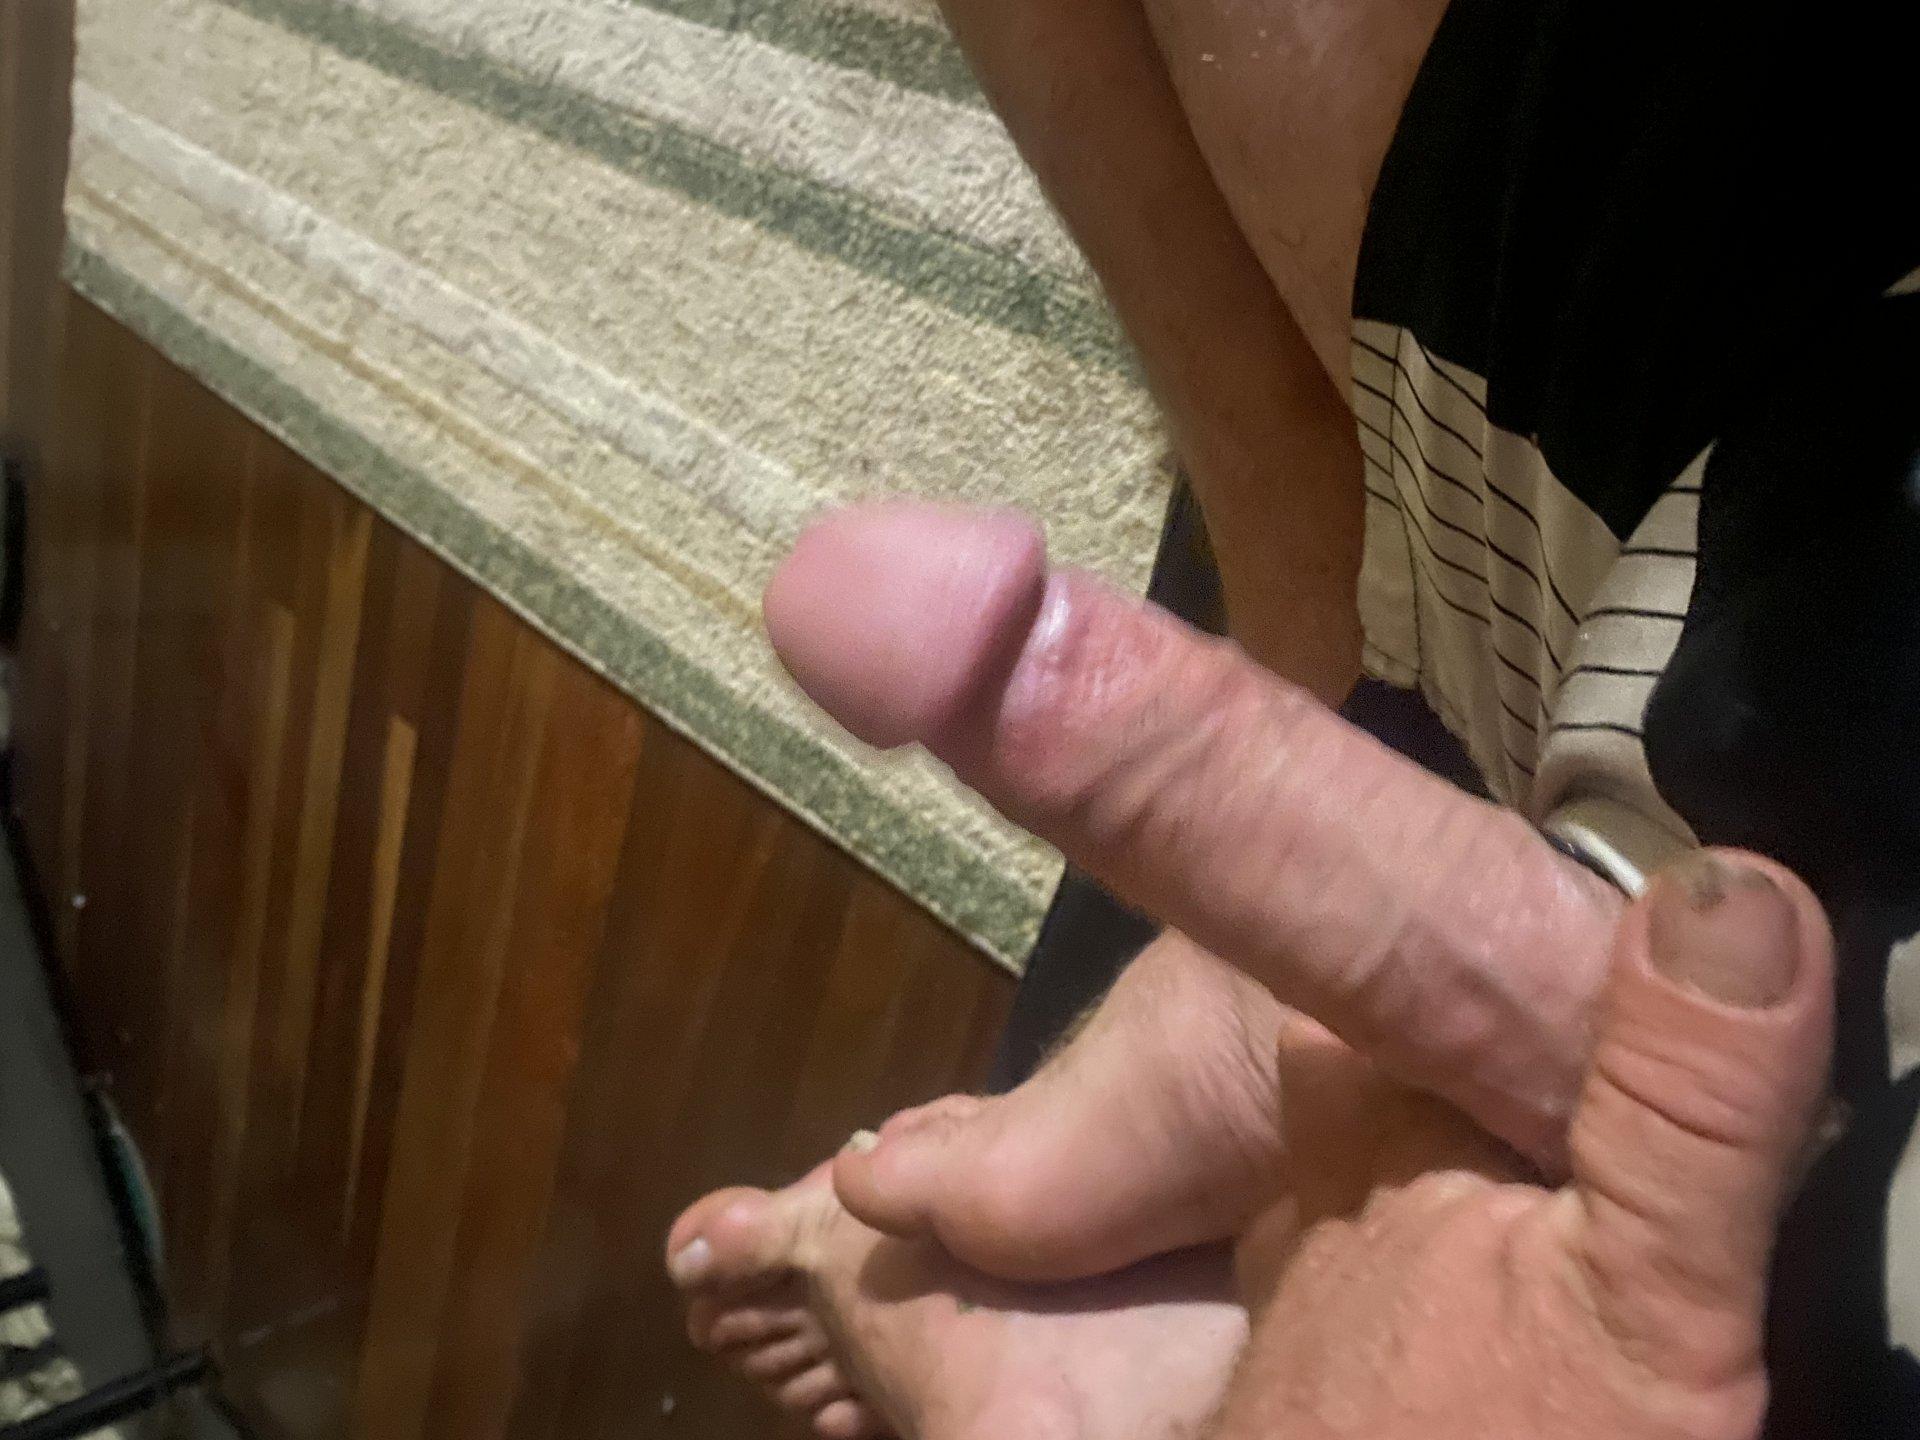 Blpdad from Queensland,Australia